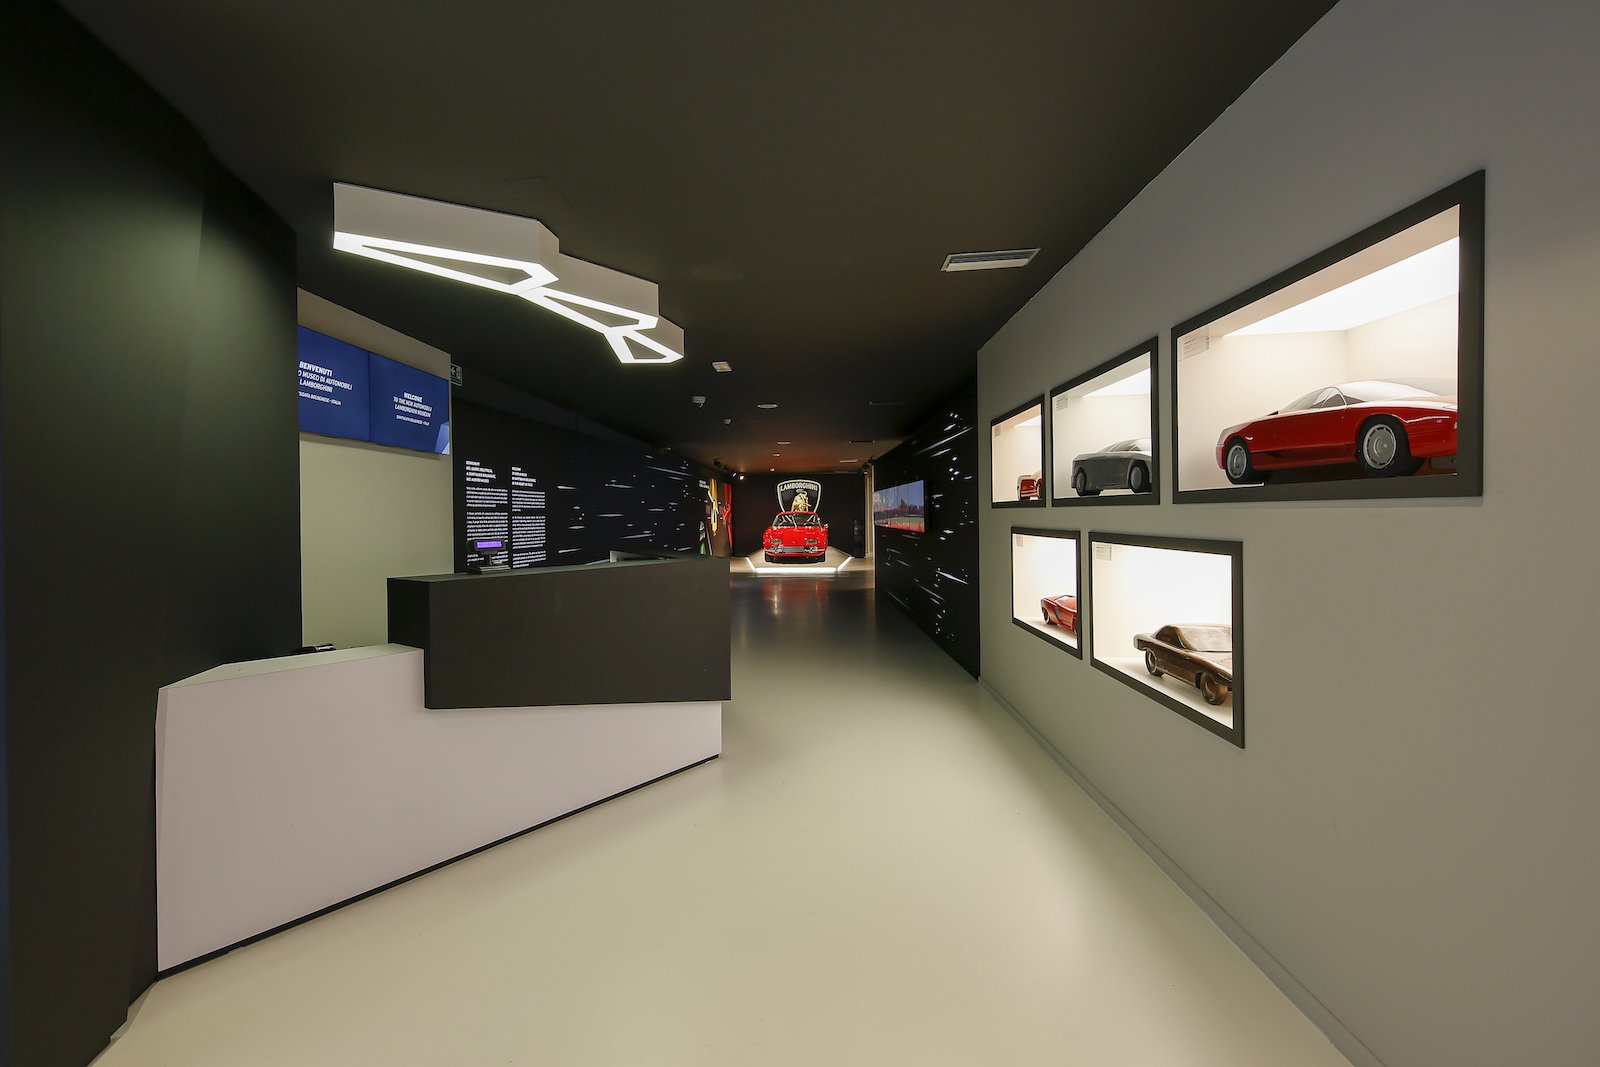 Lamborghini-Museum-Renovation-Miuras-8